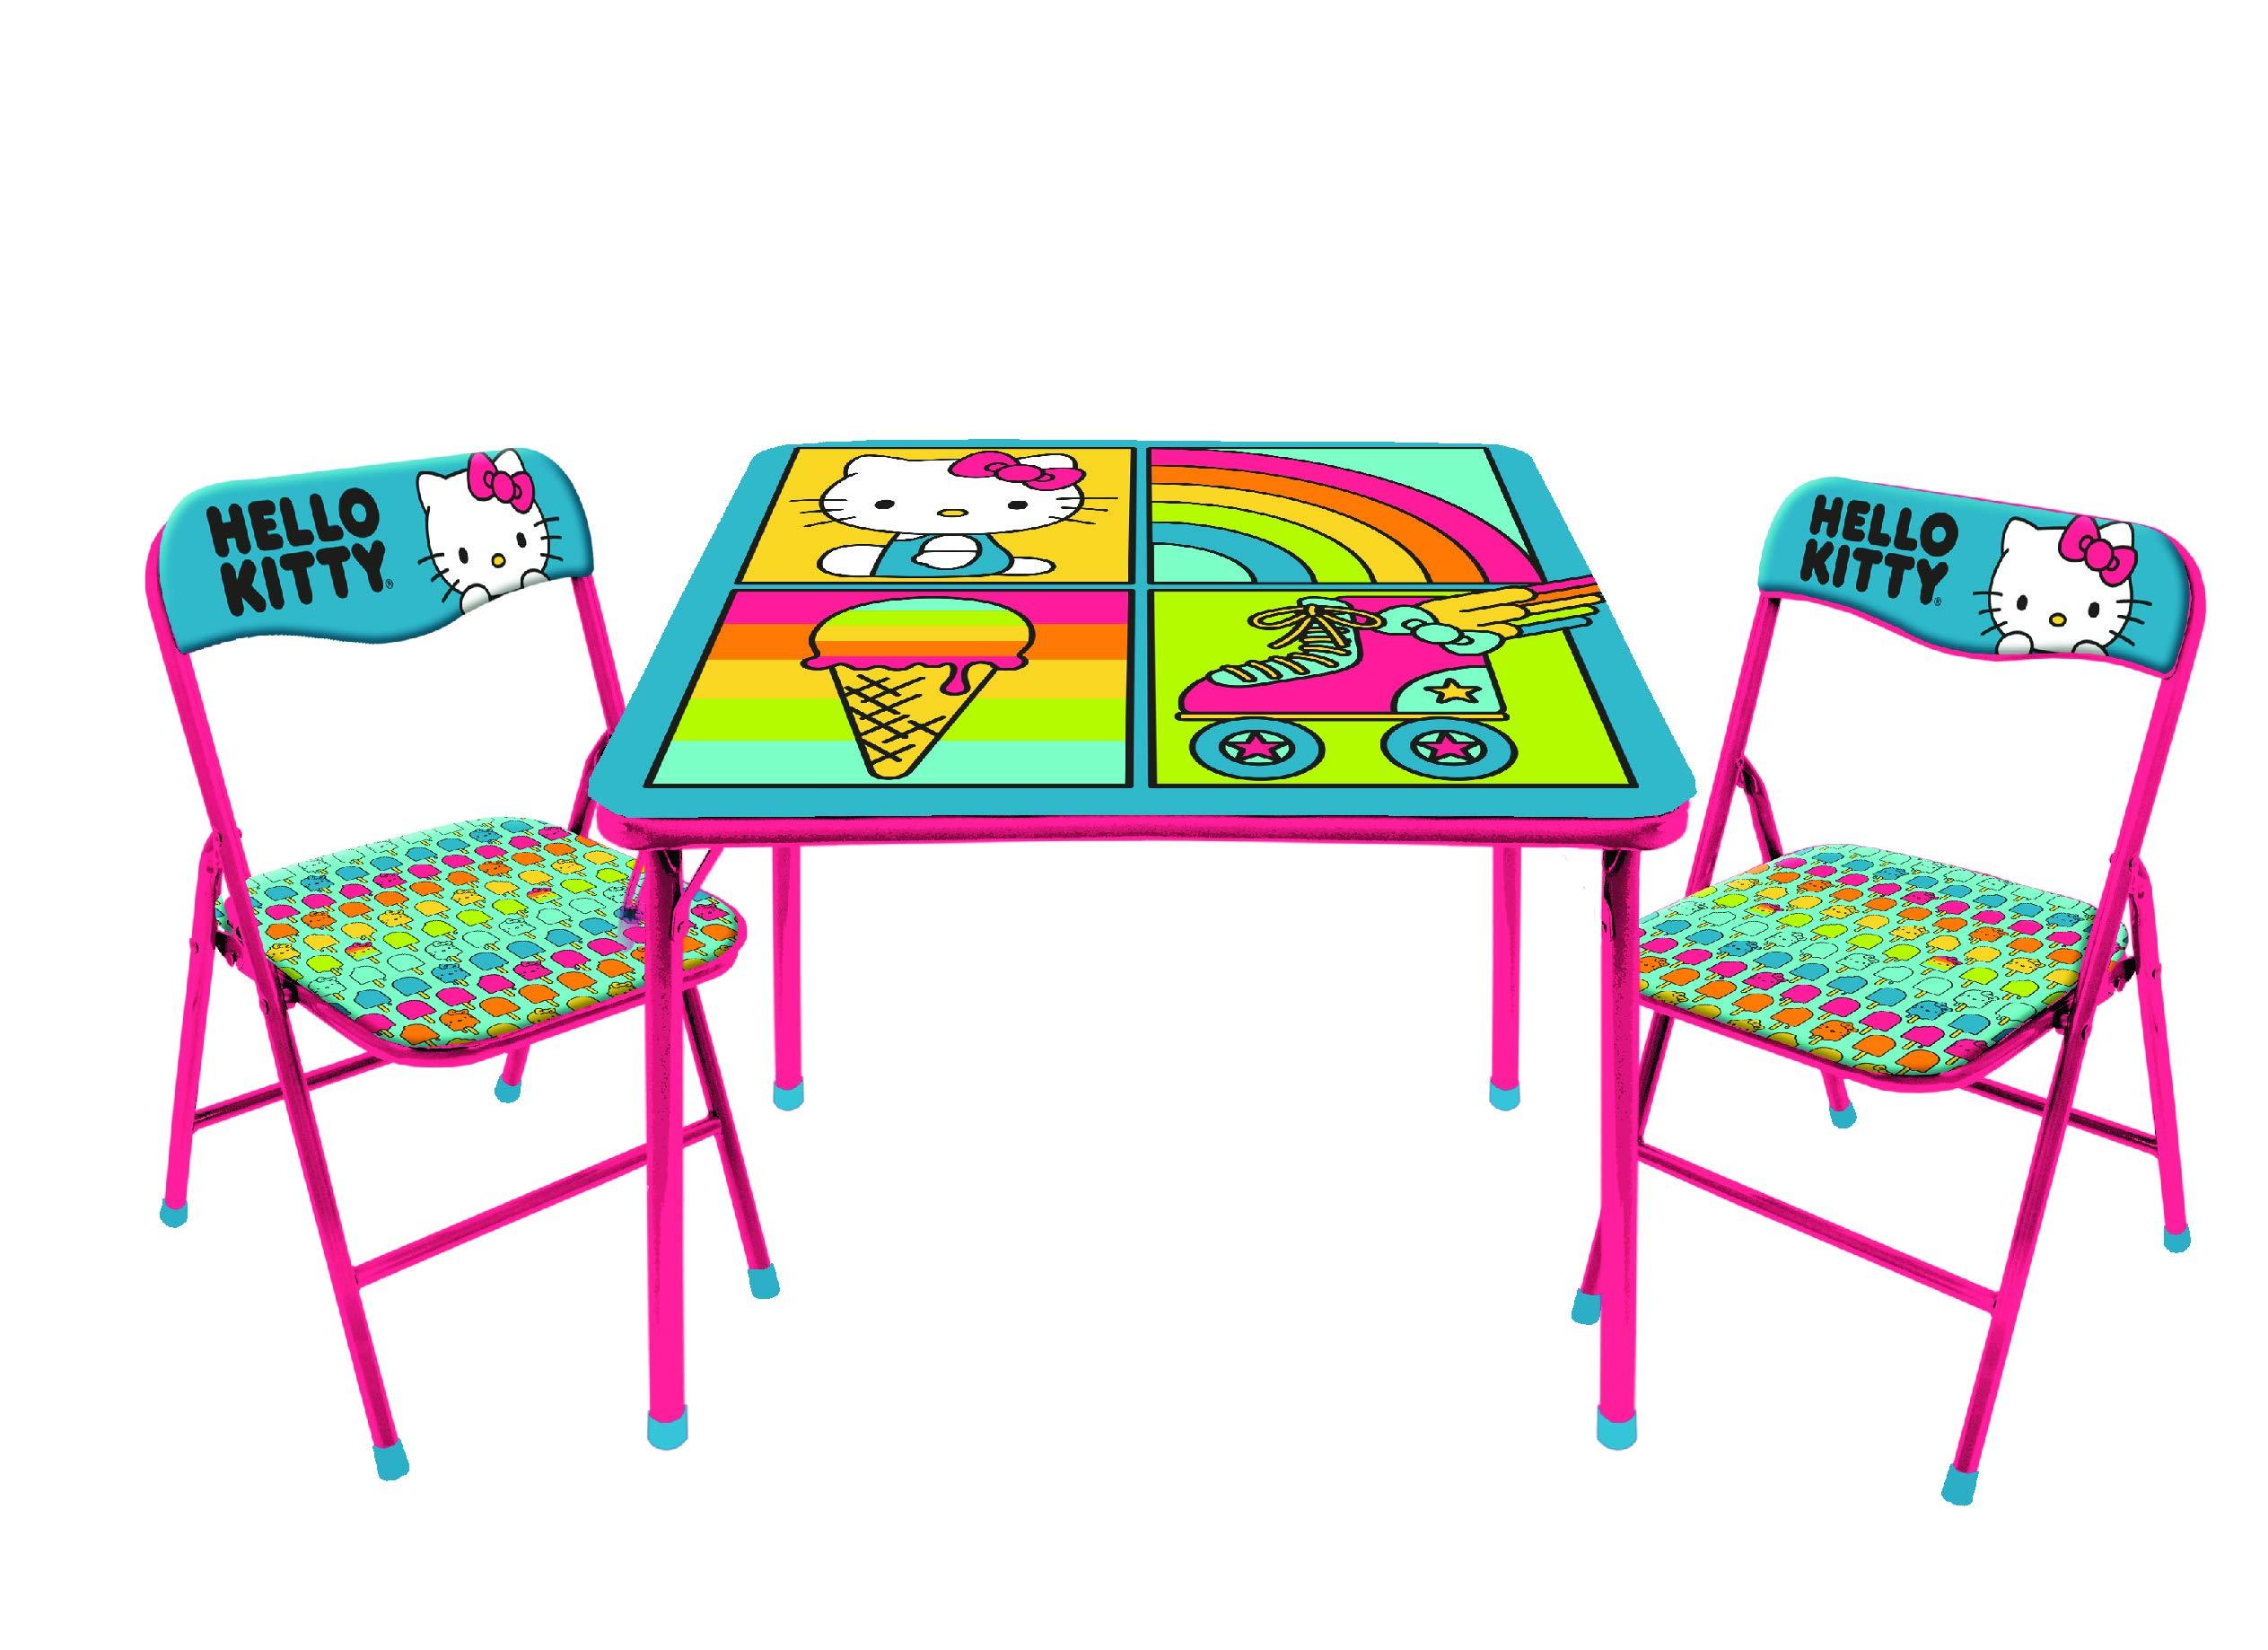 SANRIO Hello Kitty 3Piece Table & Chair Set by SANRIO